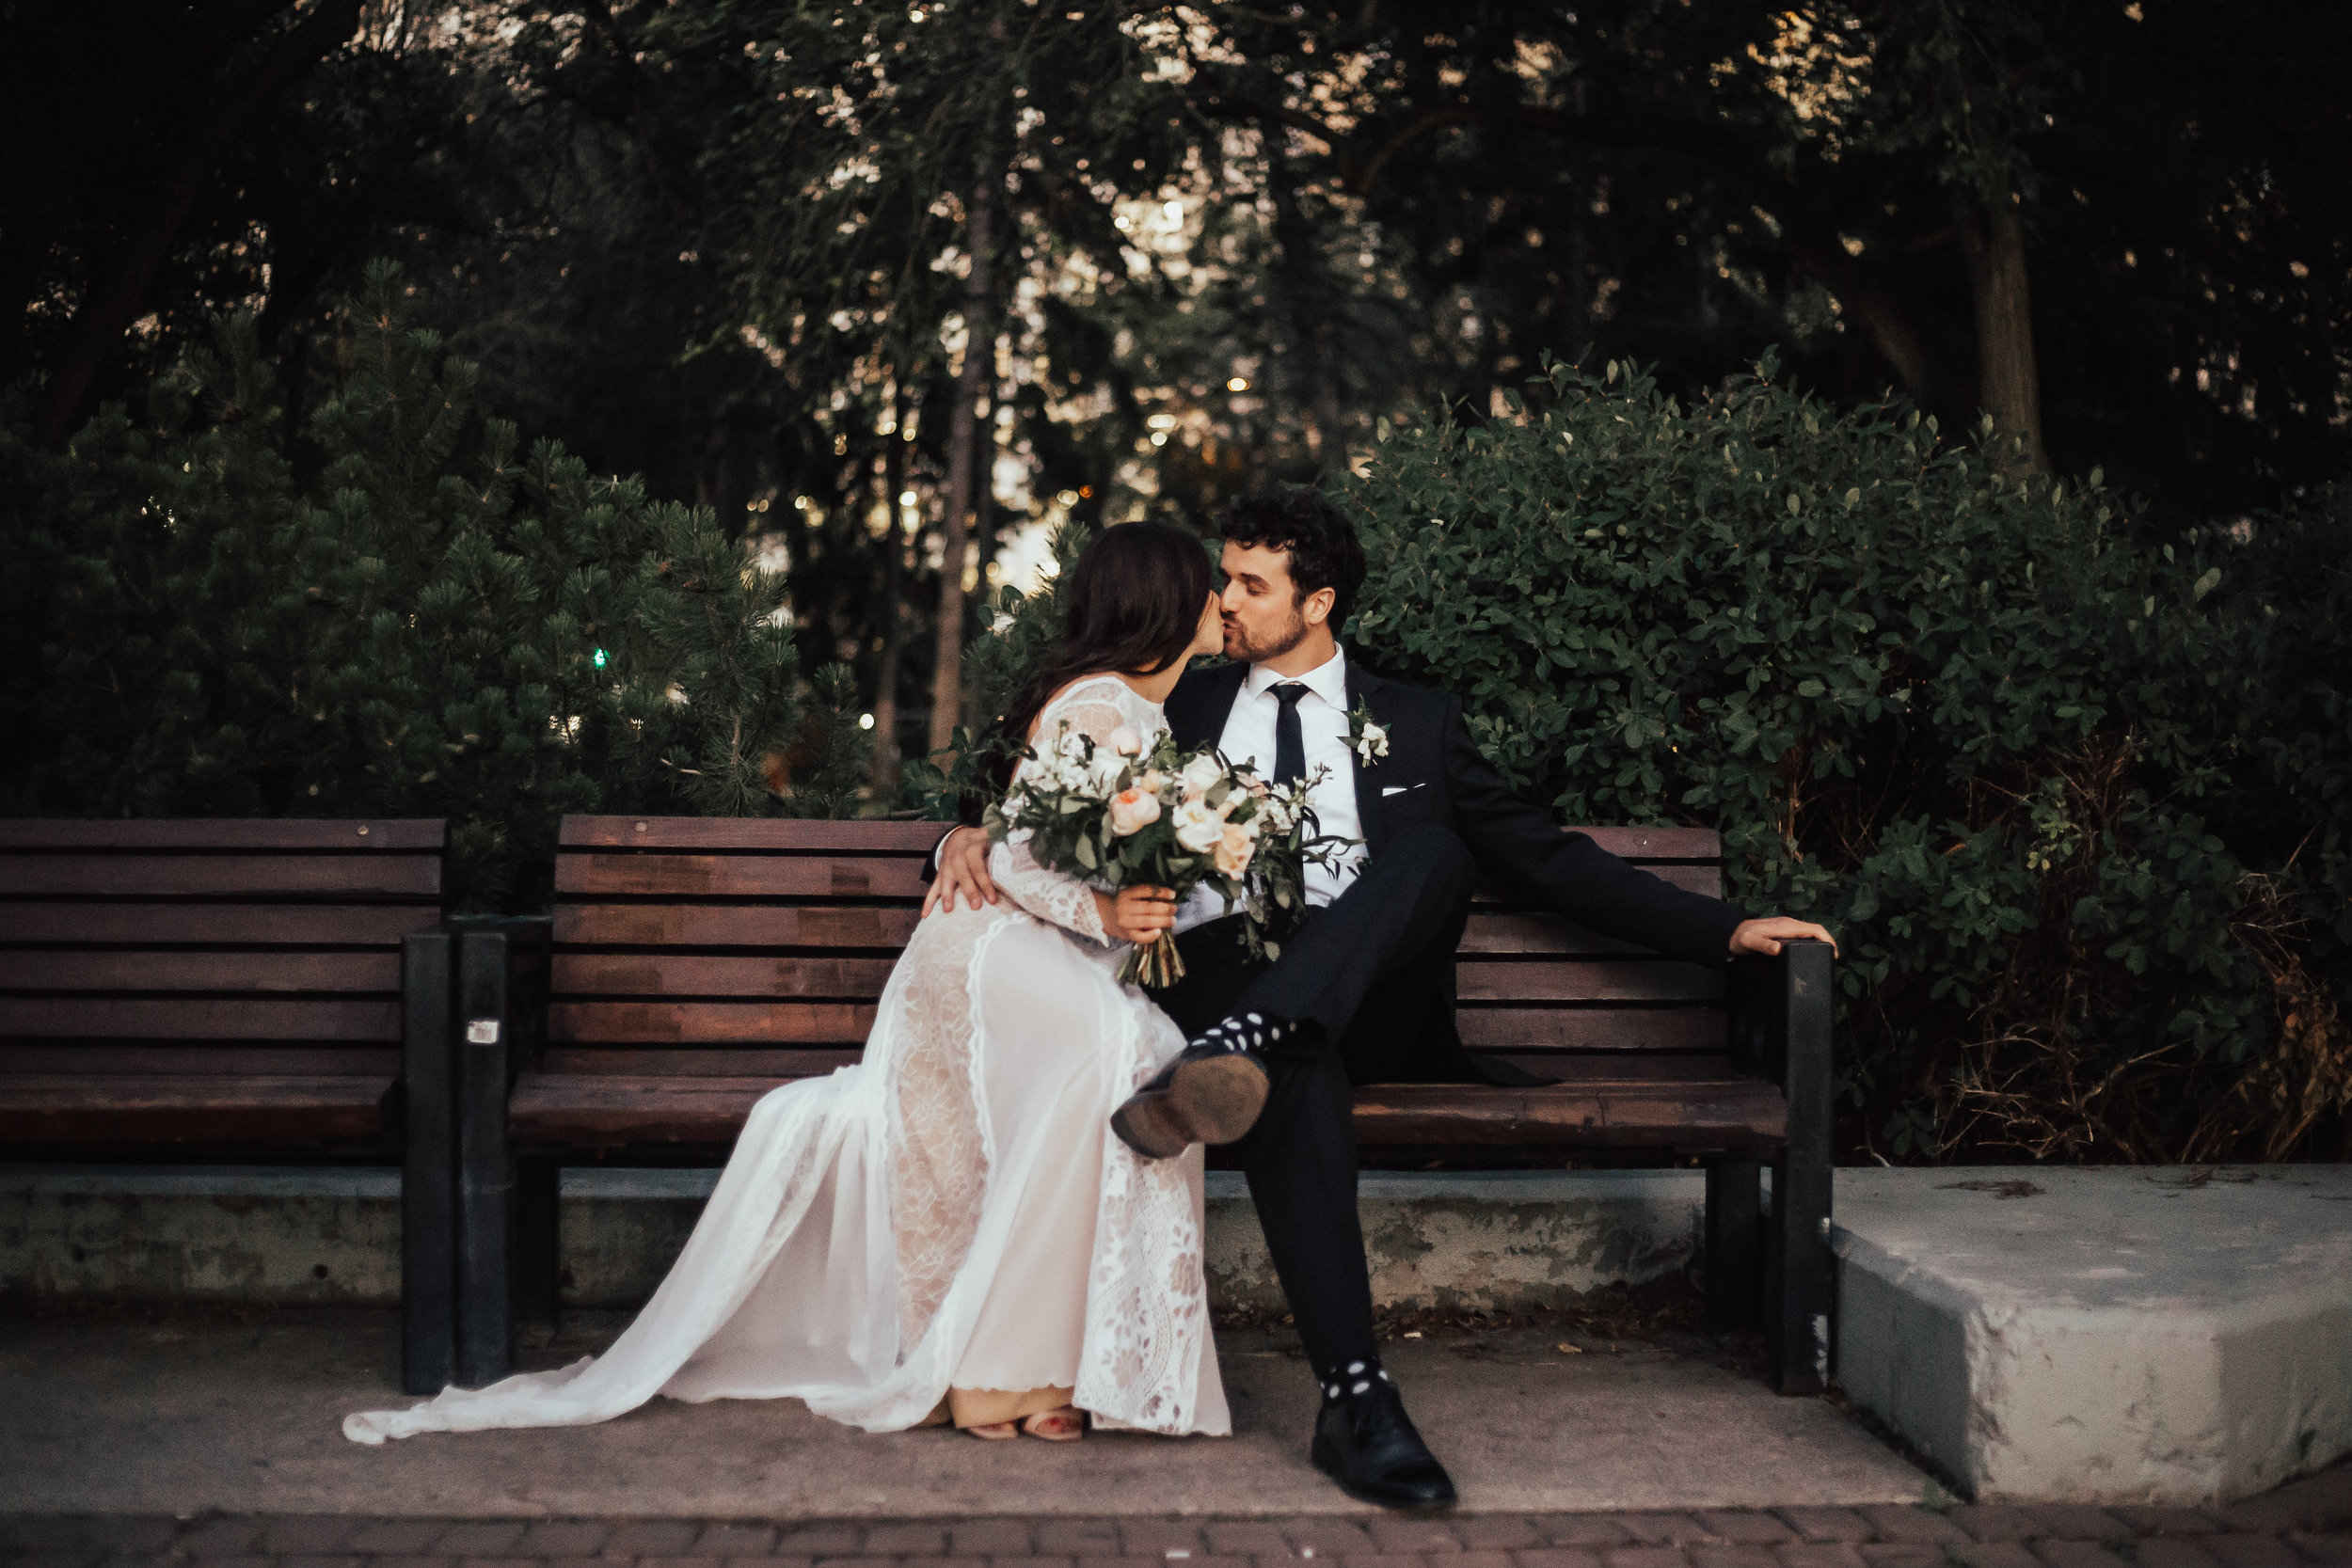 Wedding park bench.JPG